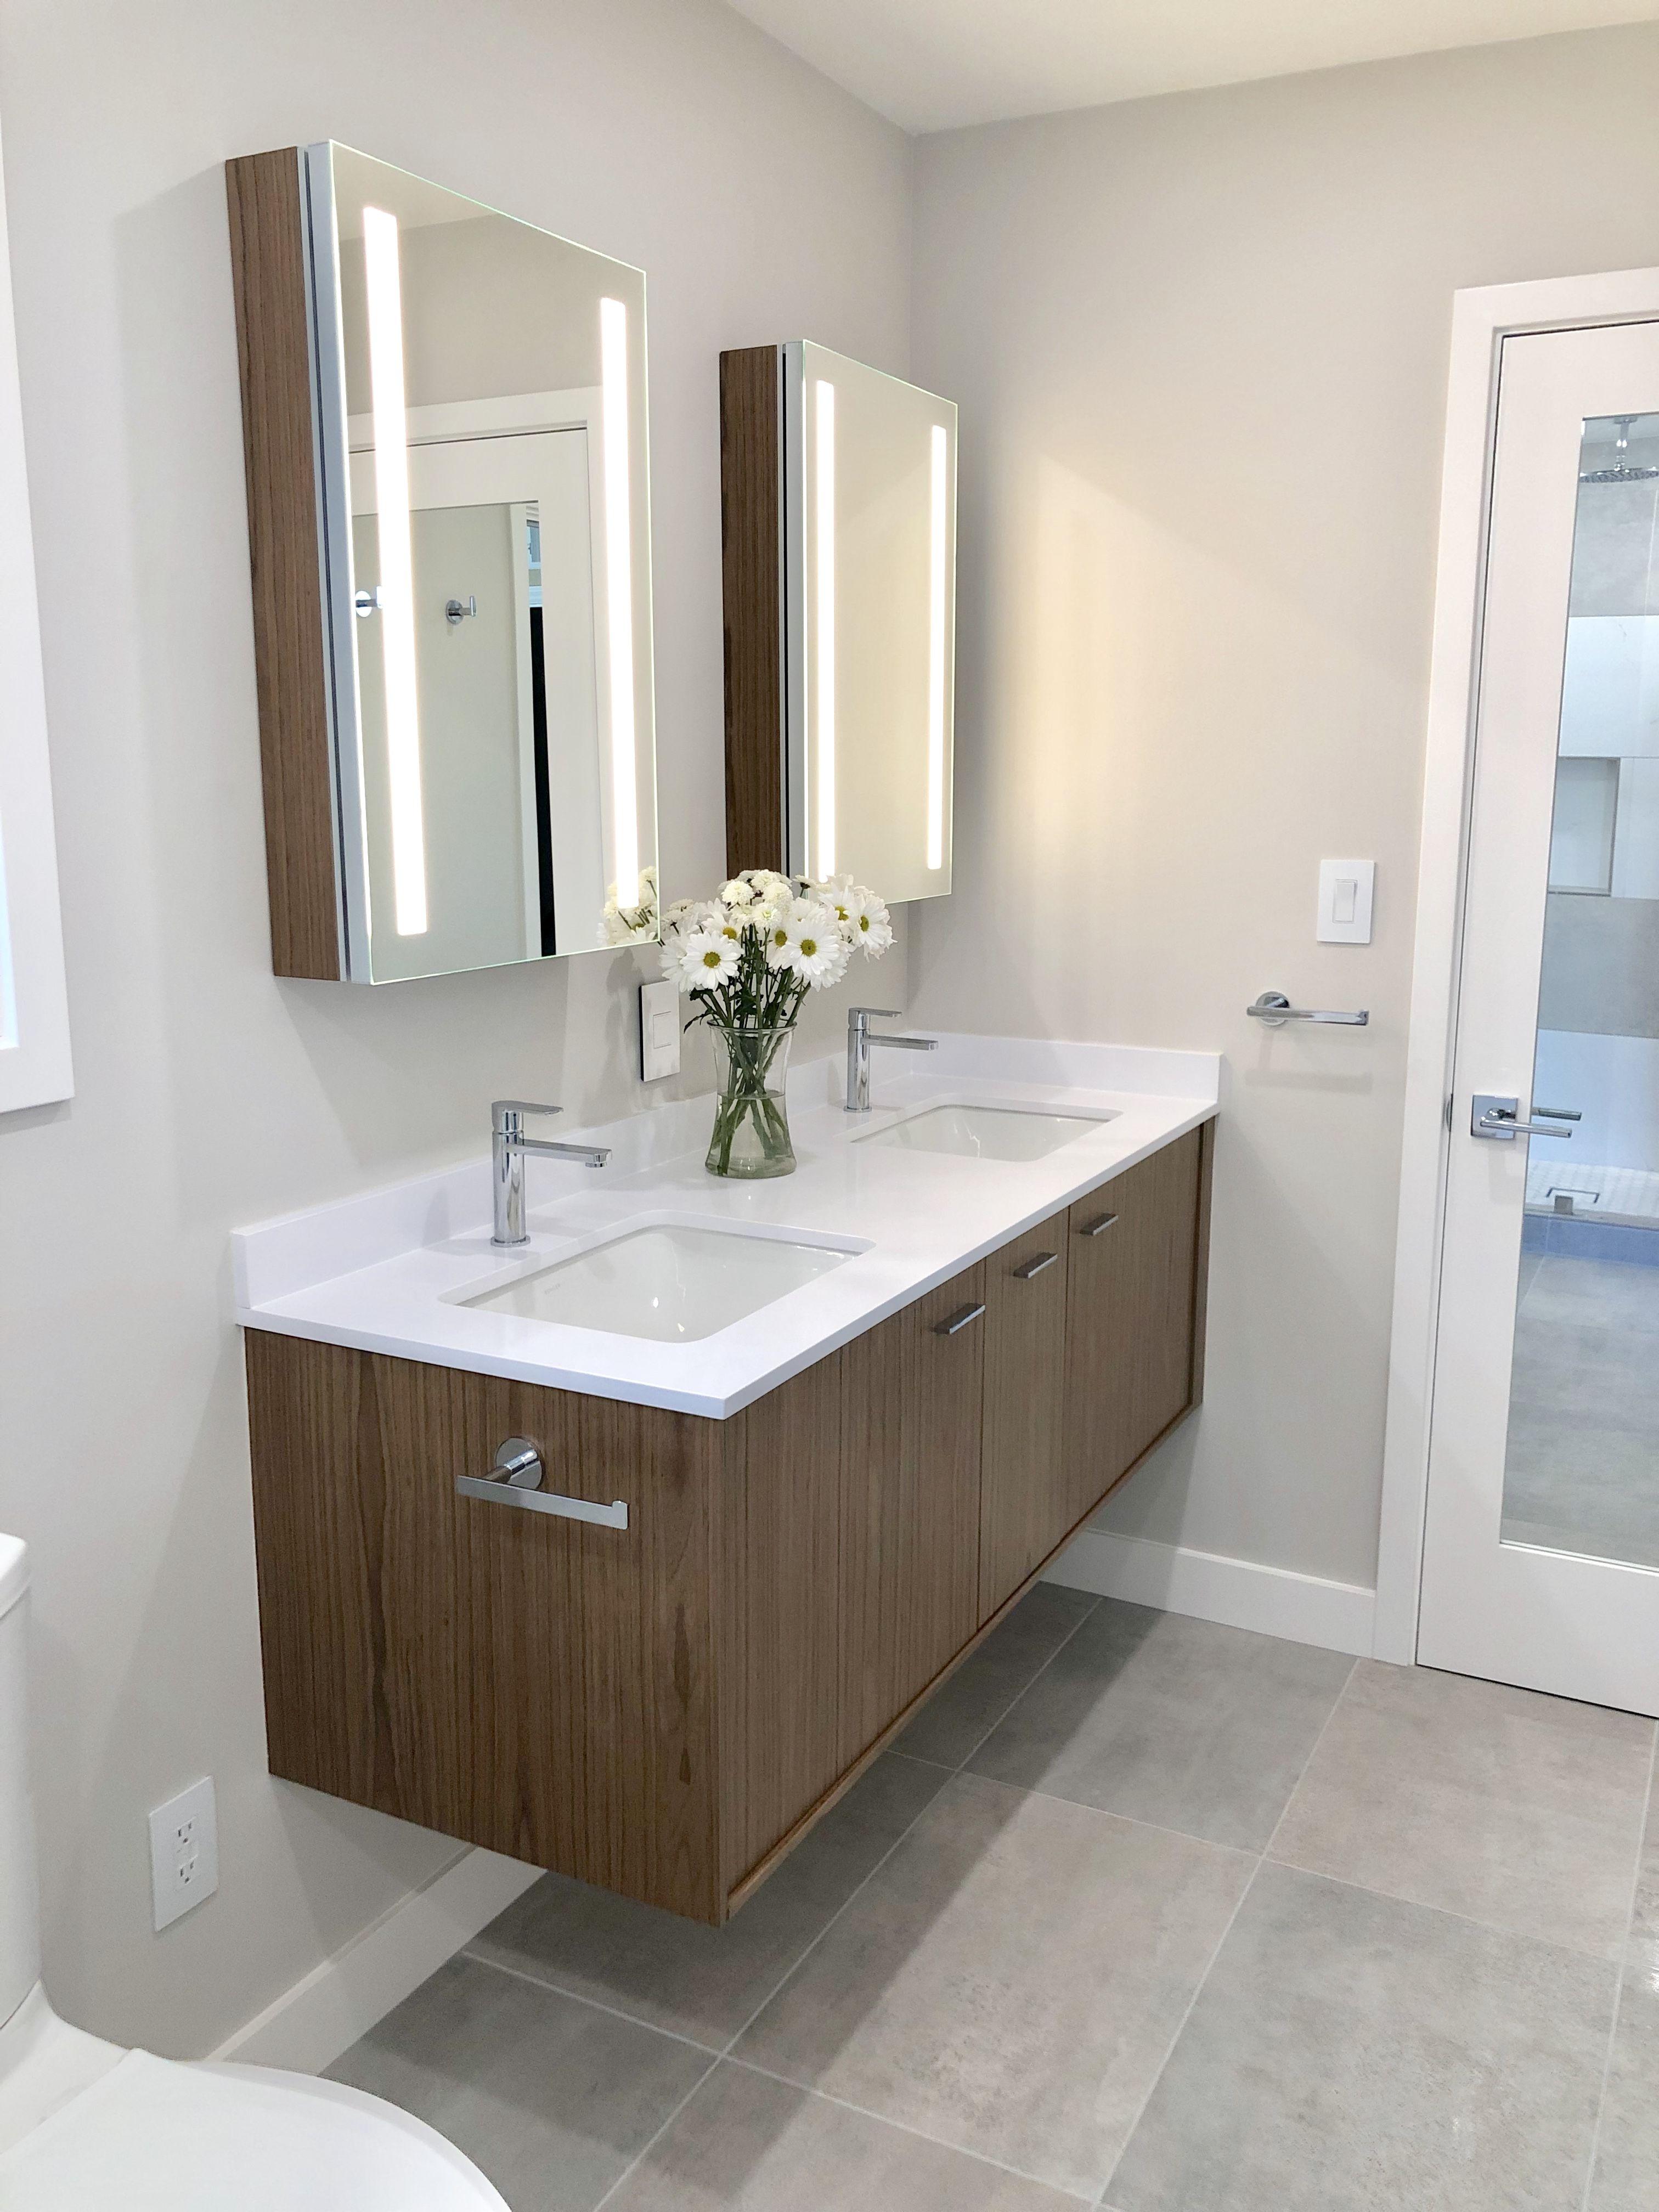 Kohler Jute Vanity Verdera Lighted Medicine Cabinets Walnut Bathroom Design Decor House Bathroom Designs Beautiful Bathroom Designs [ 4032 x 3024 Pixel ]